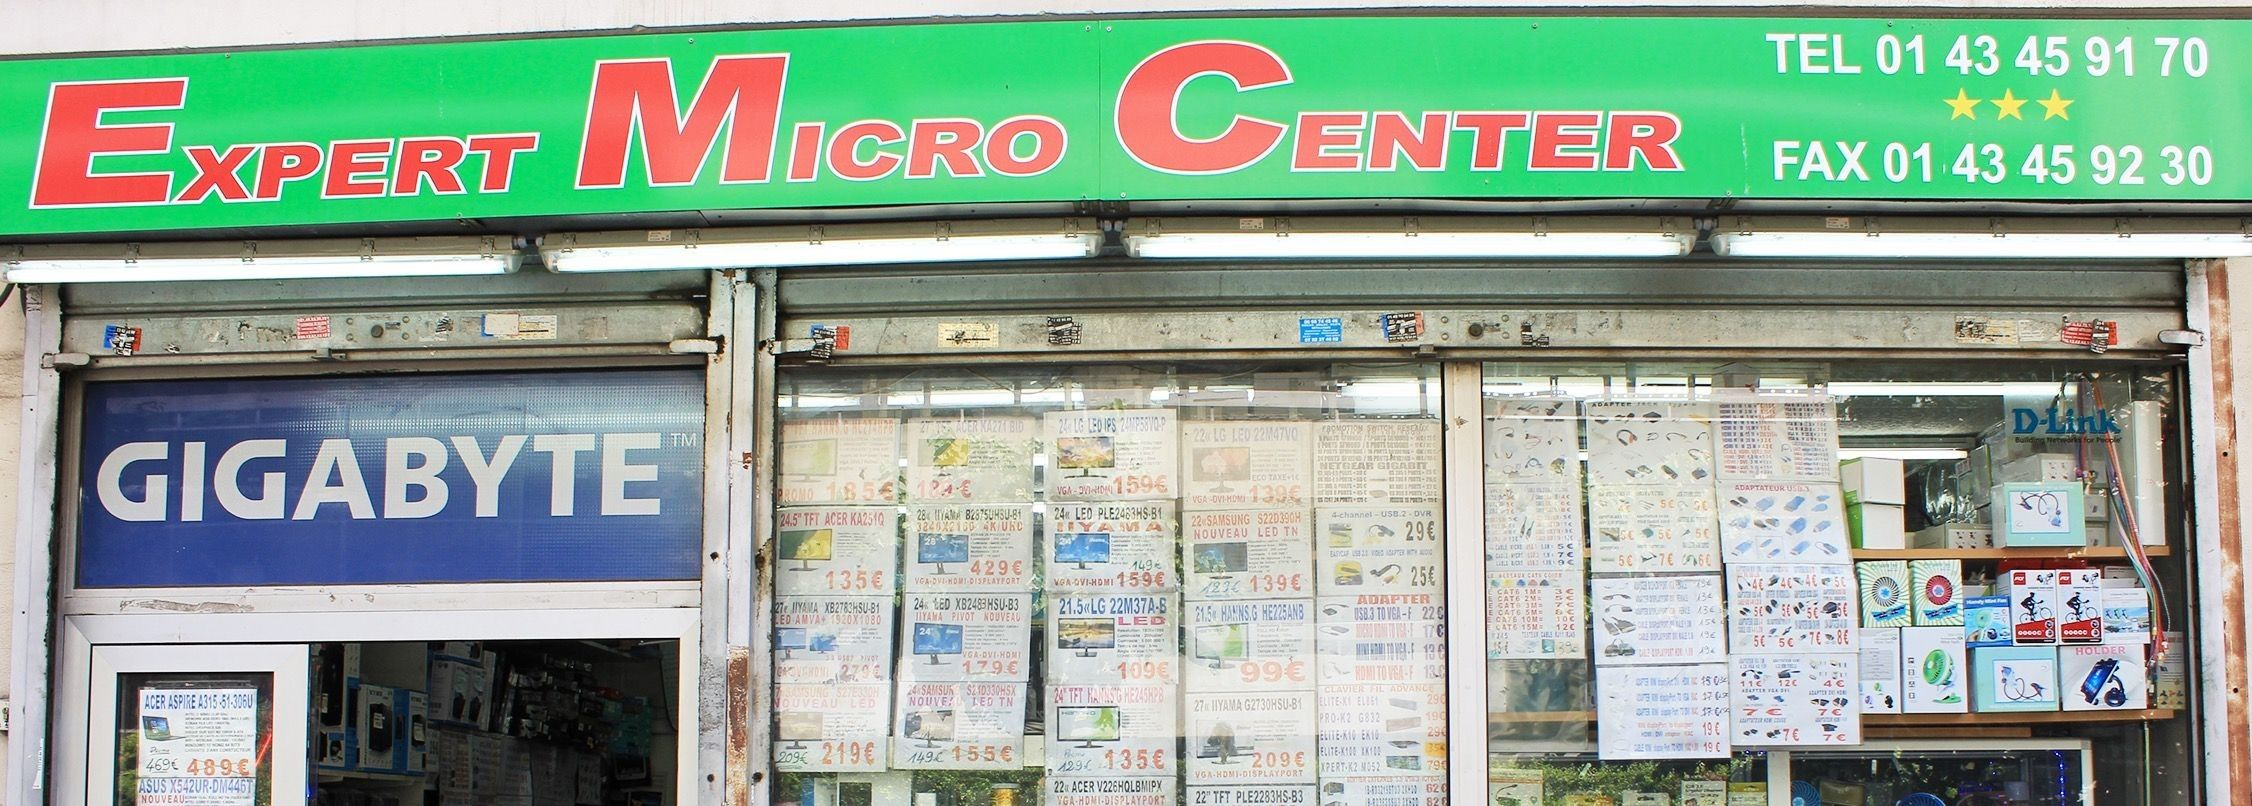 Expert Micro Center